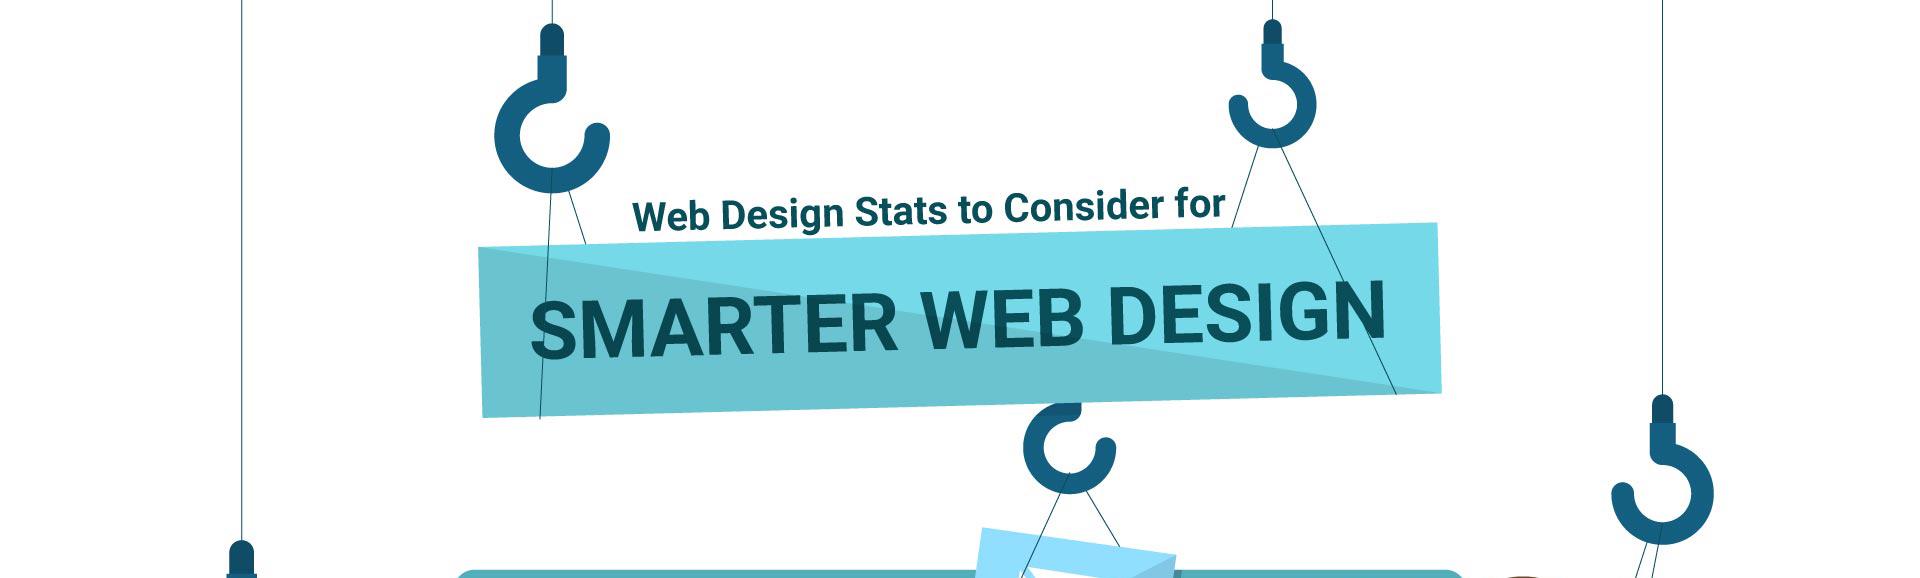 smarter-web-design-thump